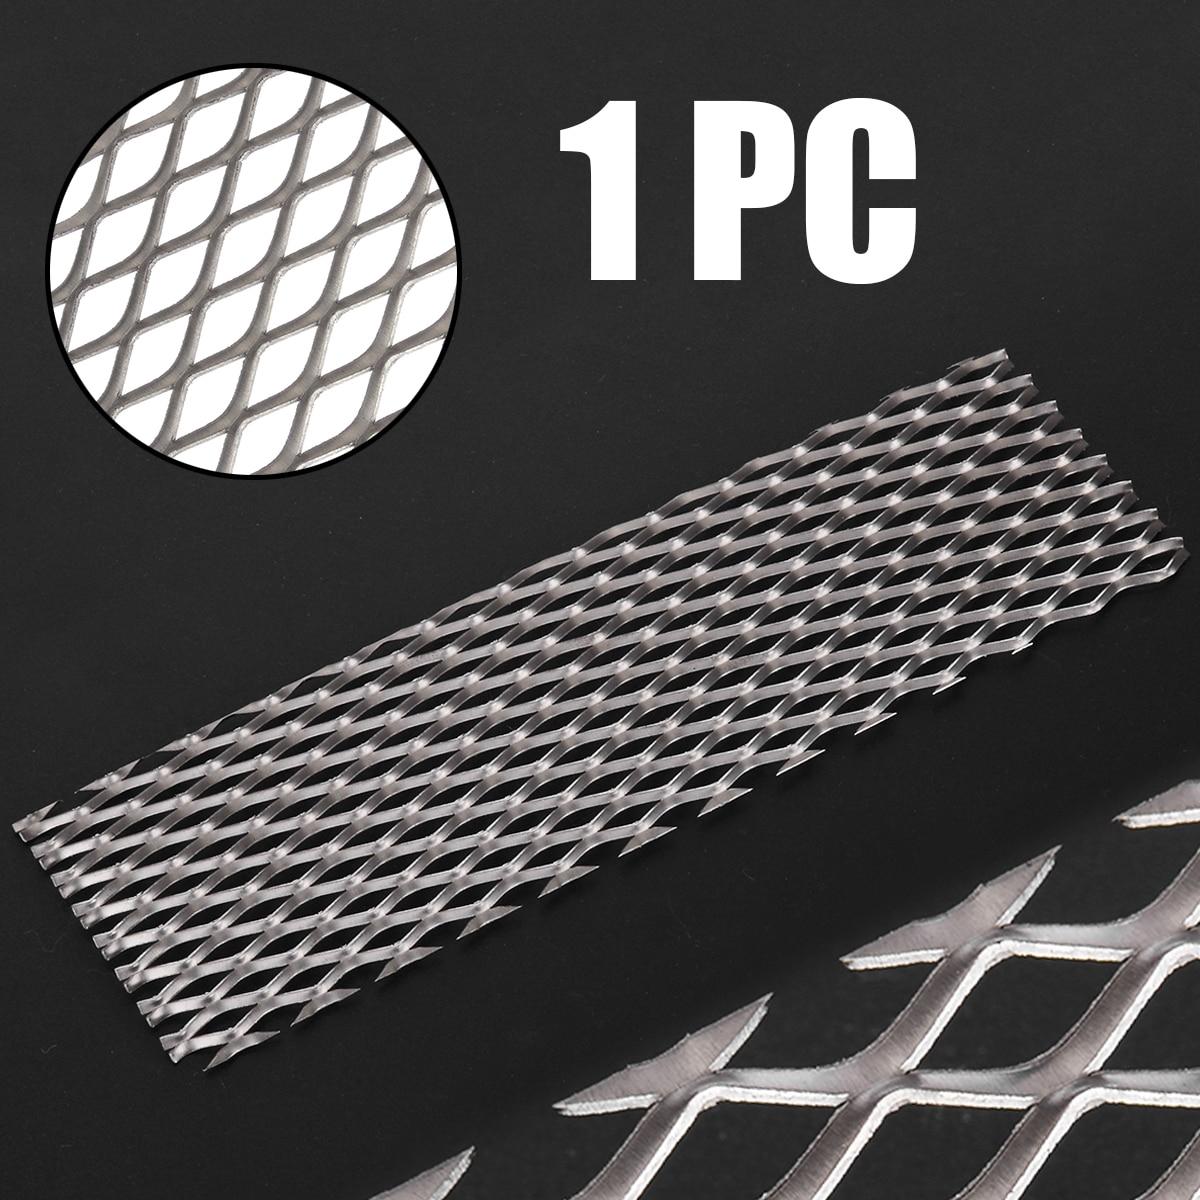 1pc Rectangle Titanium Sheet 50mm*165mm Recycled Metal Titanium Mesh Electrode Heat Corrosion Resistance For Electrolysis